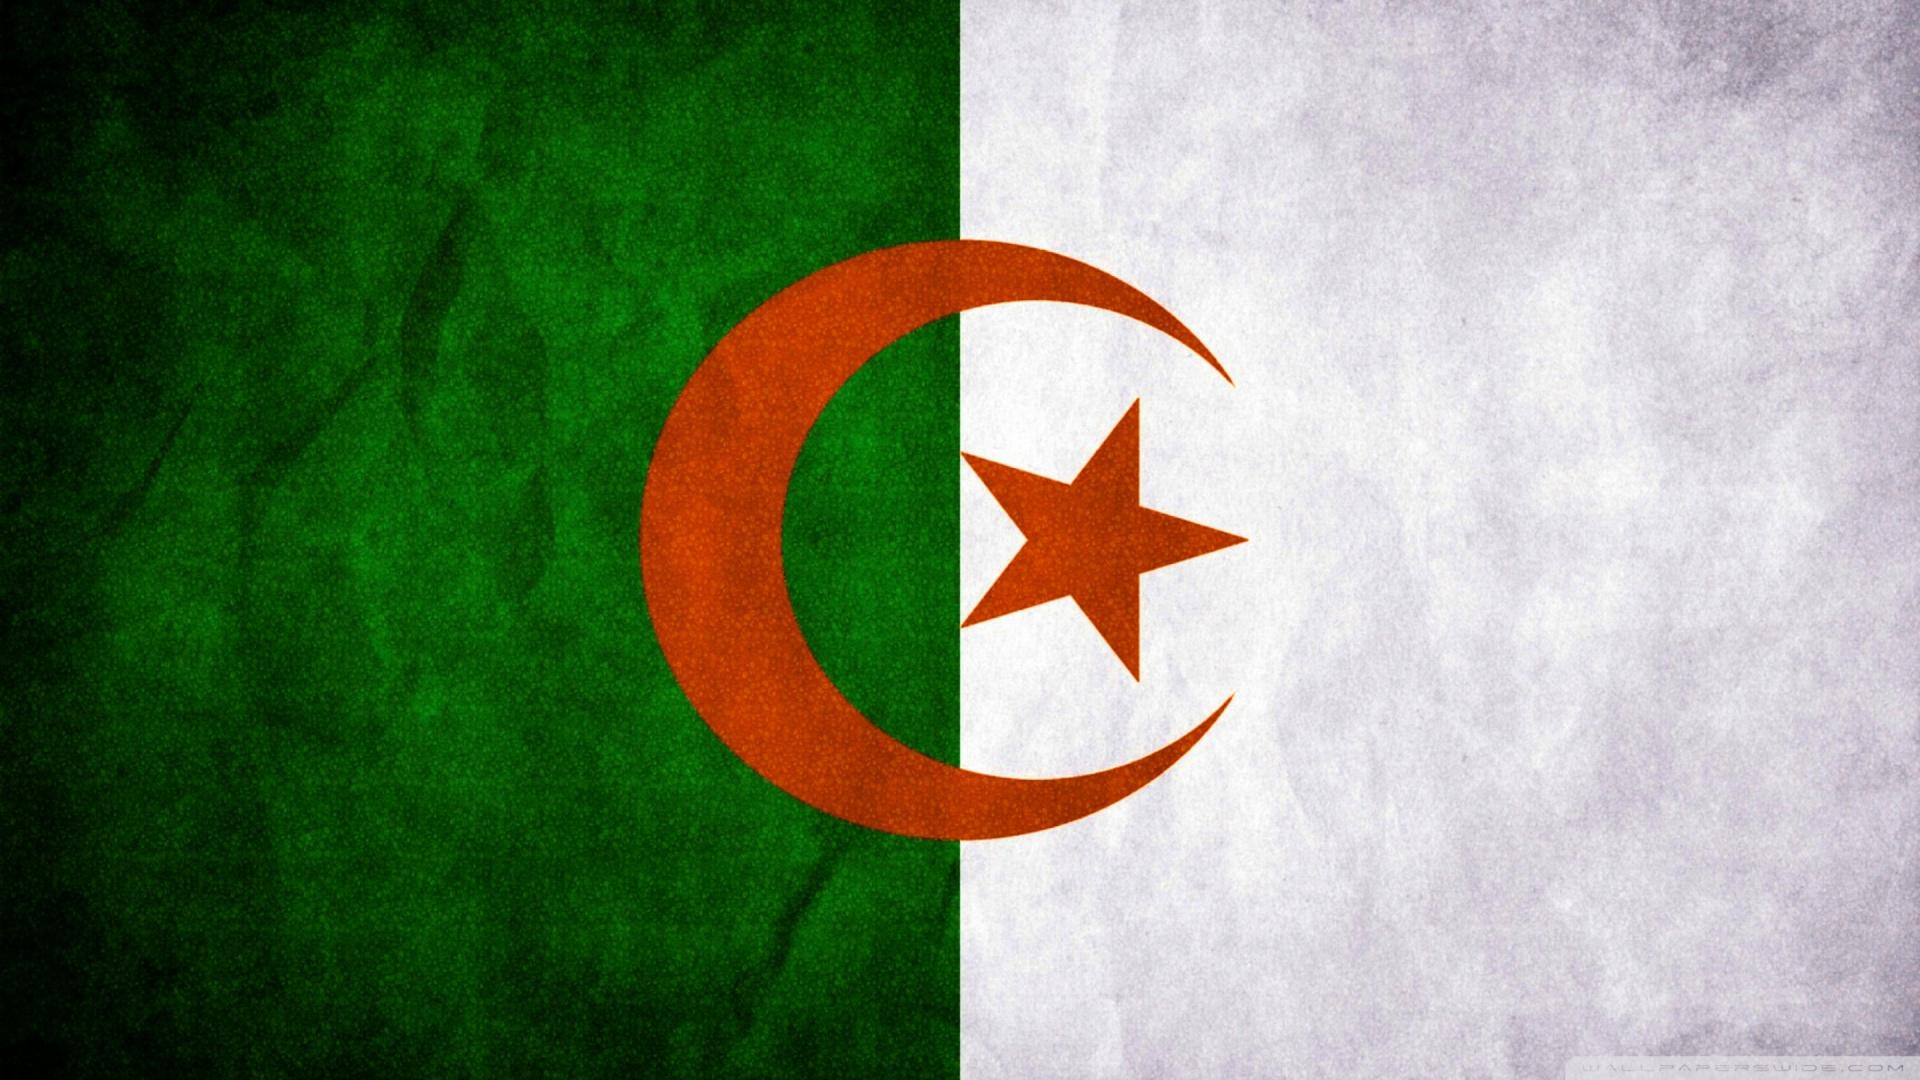 Algeria Flag 4K HD Desktop Wallpaper for 4K Ultra HD TV Dual 1920x1080